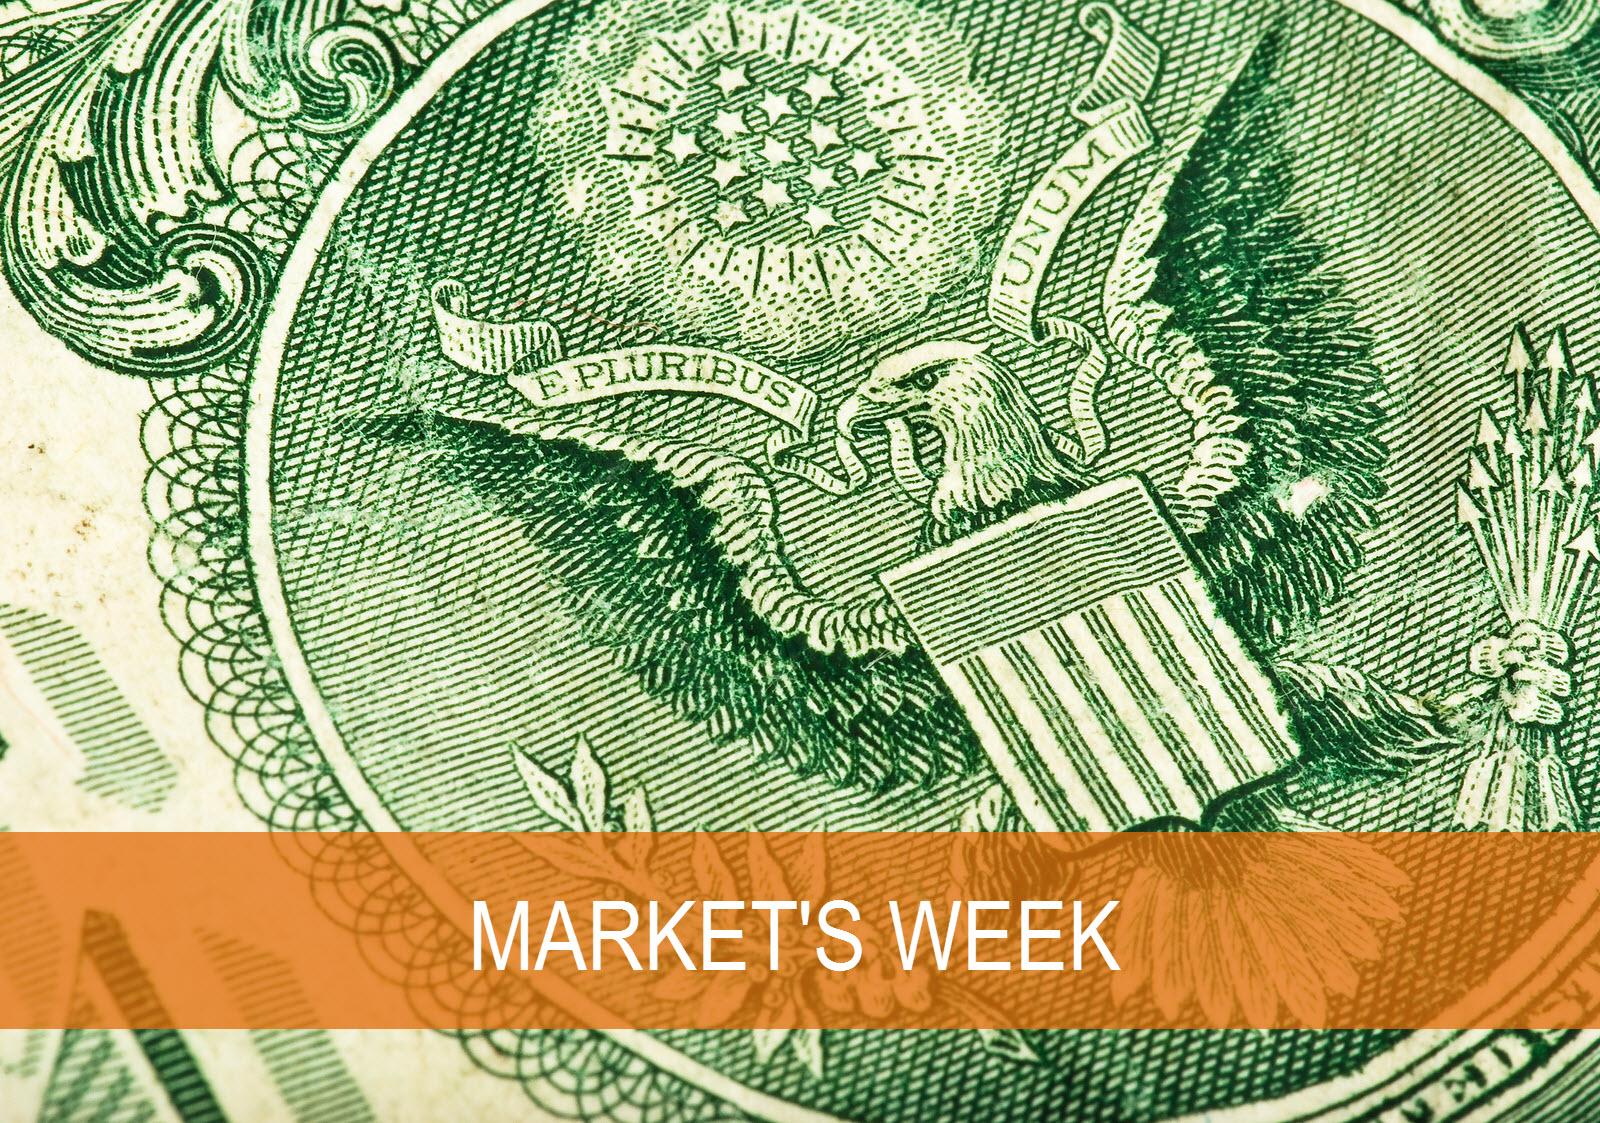 MarketsWeekPic_04Feb2019